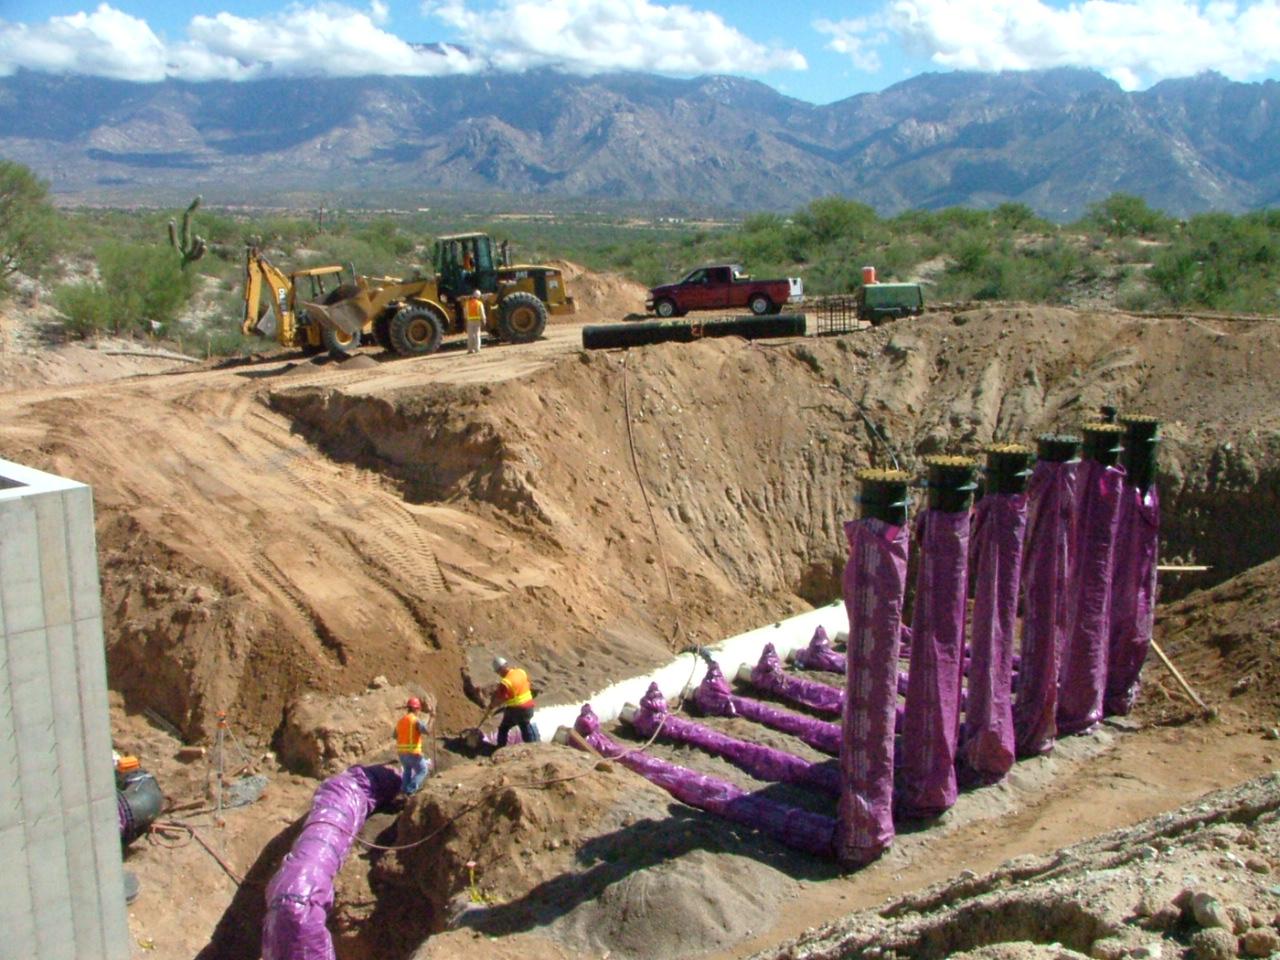 Pump Station & 1.5M Gal Reservoir, Oro Valley, Arizona